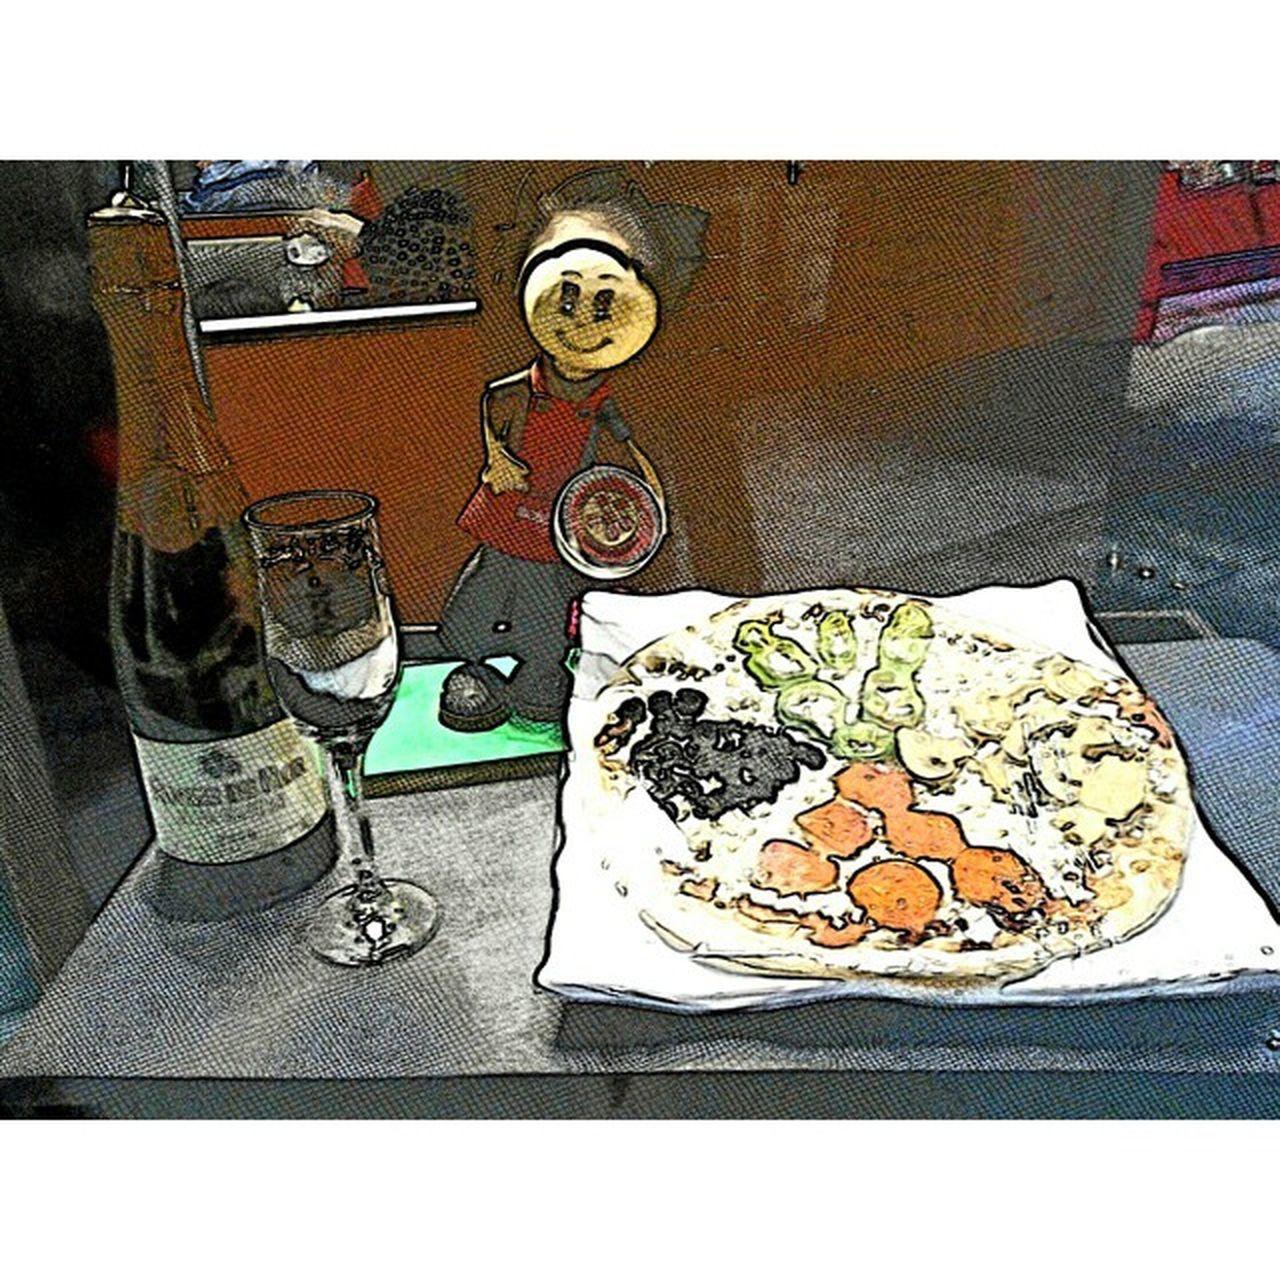 DiCarloArtisan Tasting Pizza Cornellà .